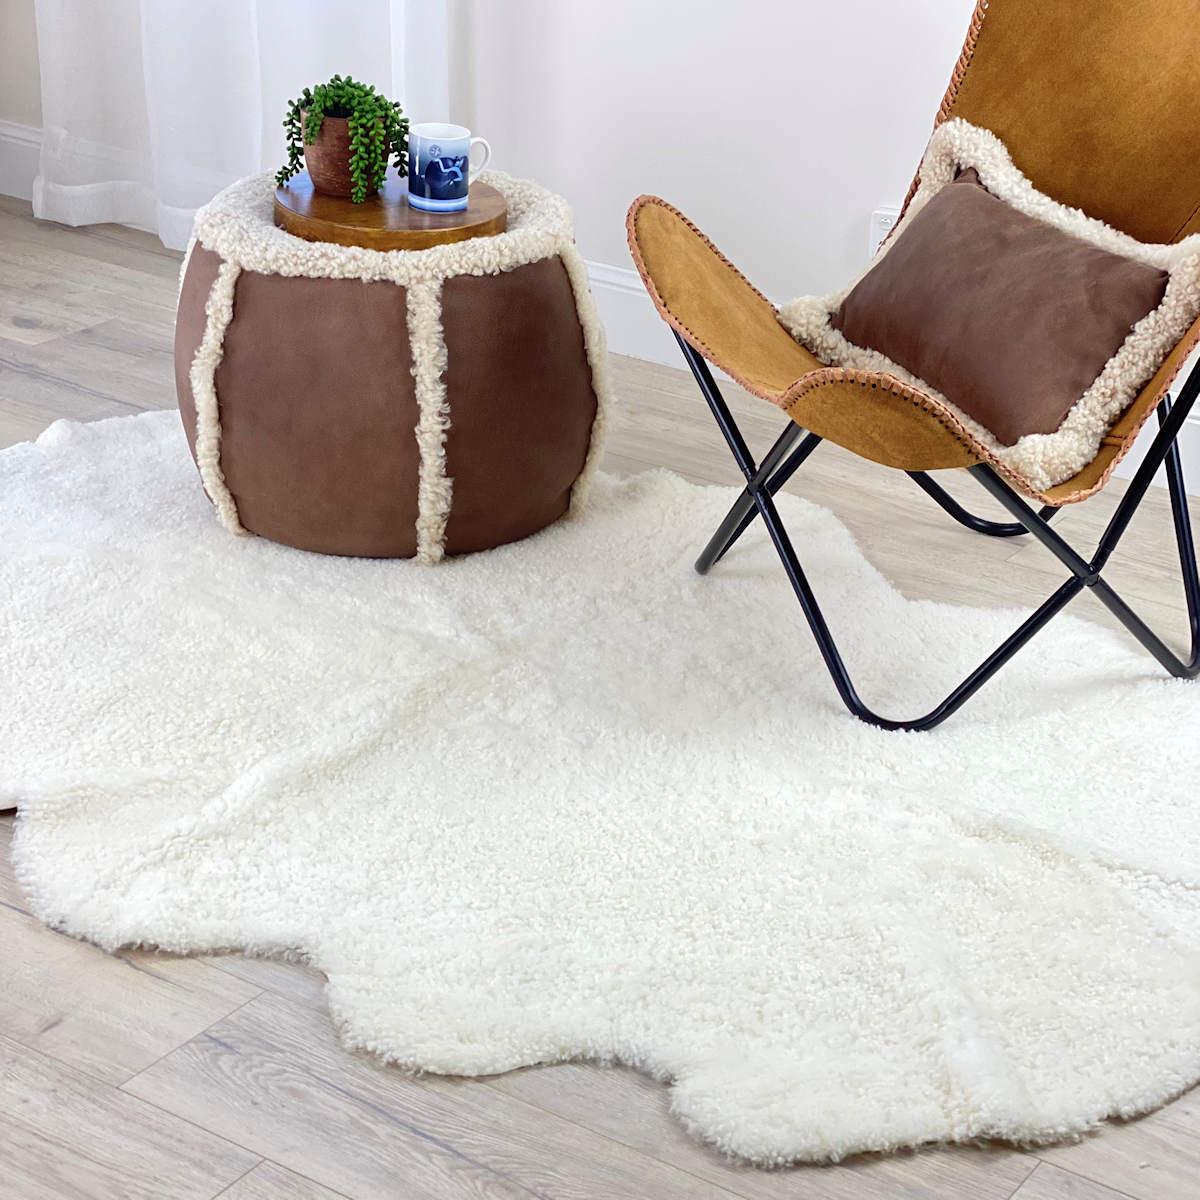 shearling-sheepskin-rug